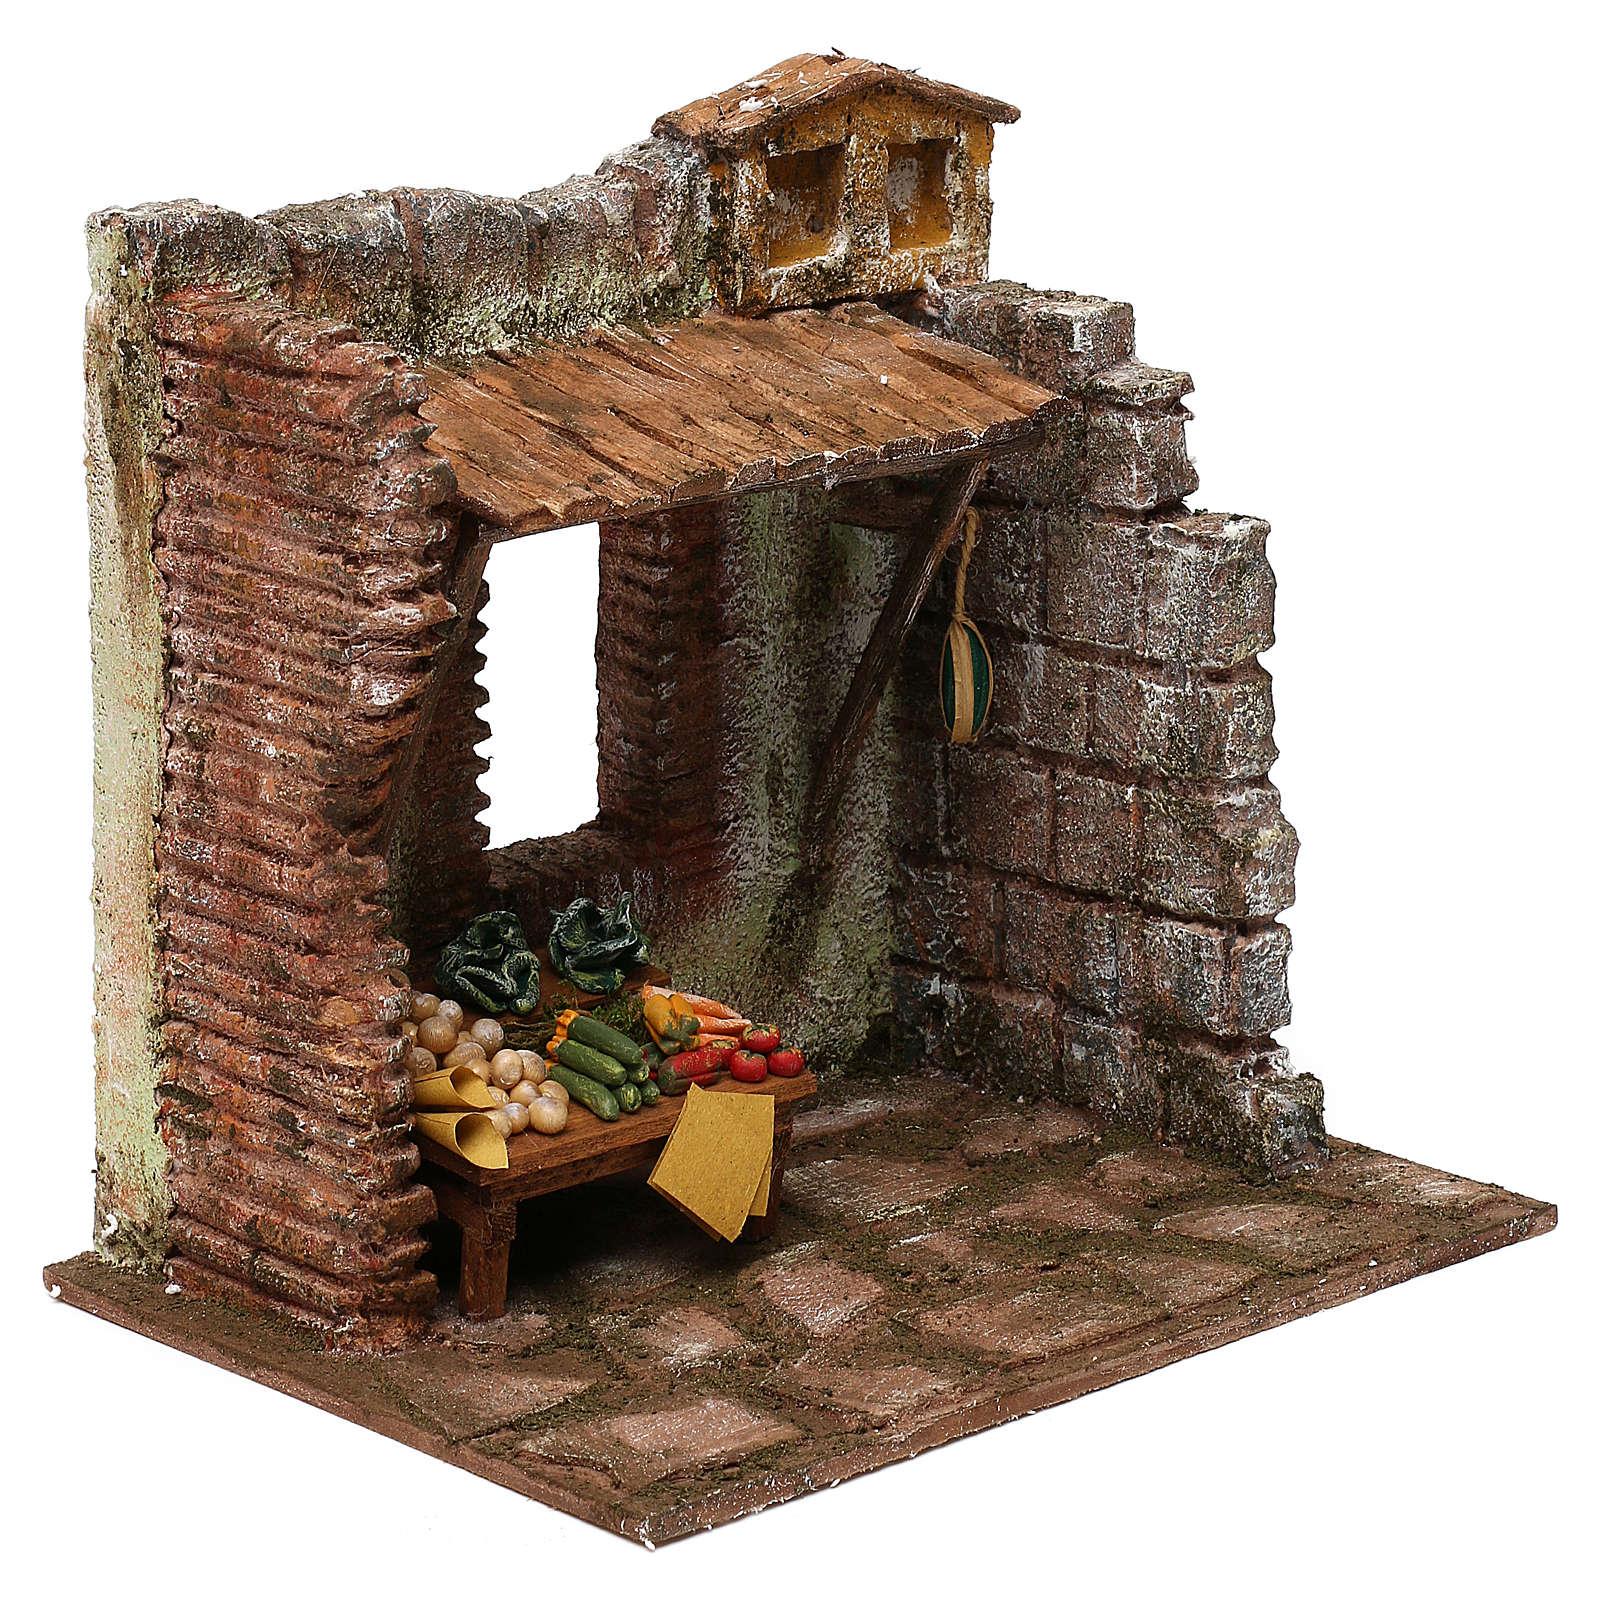 Greengrocer setting for 10 cm Nativity scene, 20x25x20 cm 4